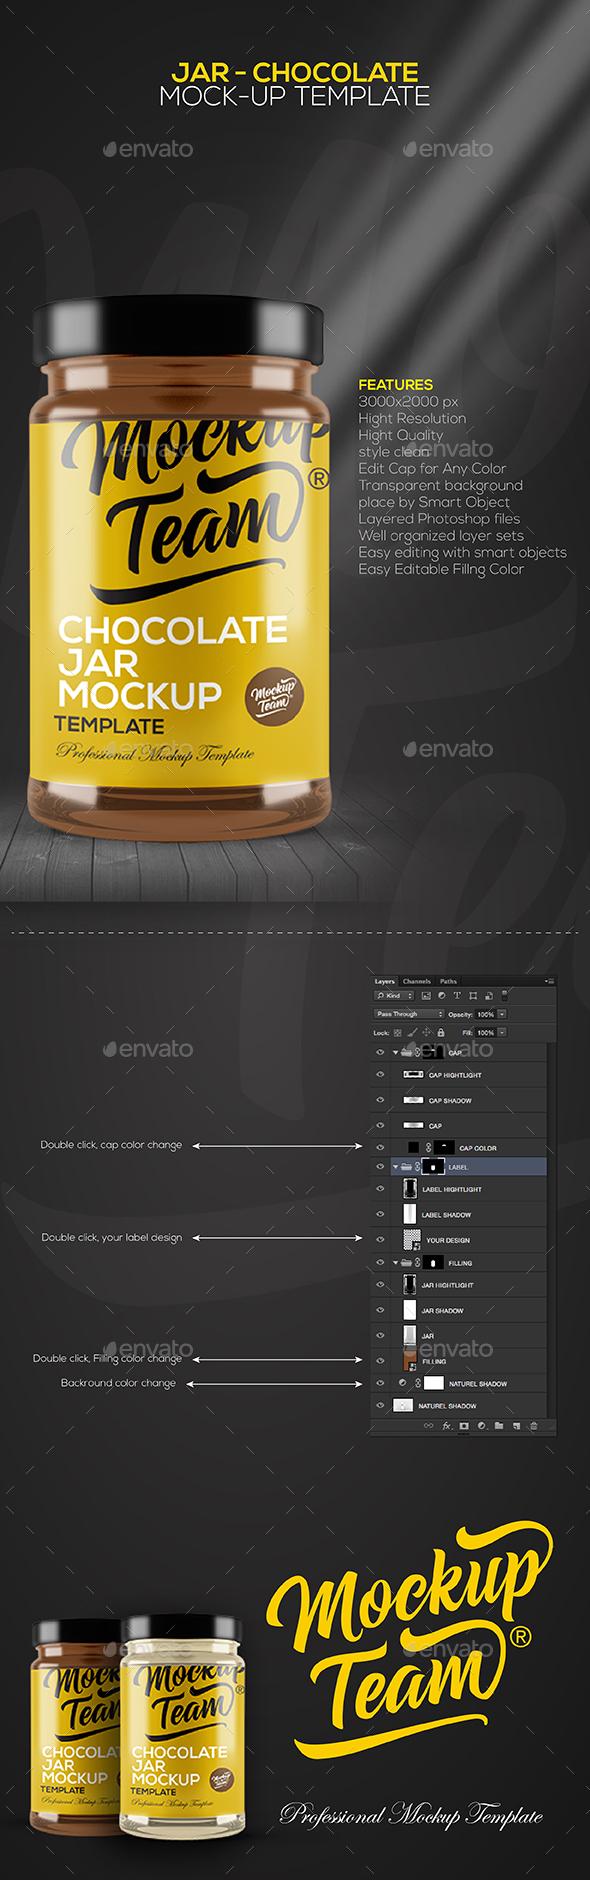 Jar - Chocolate Mock-up Template